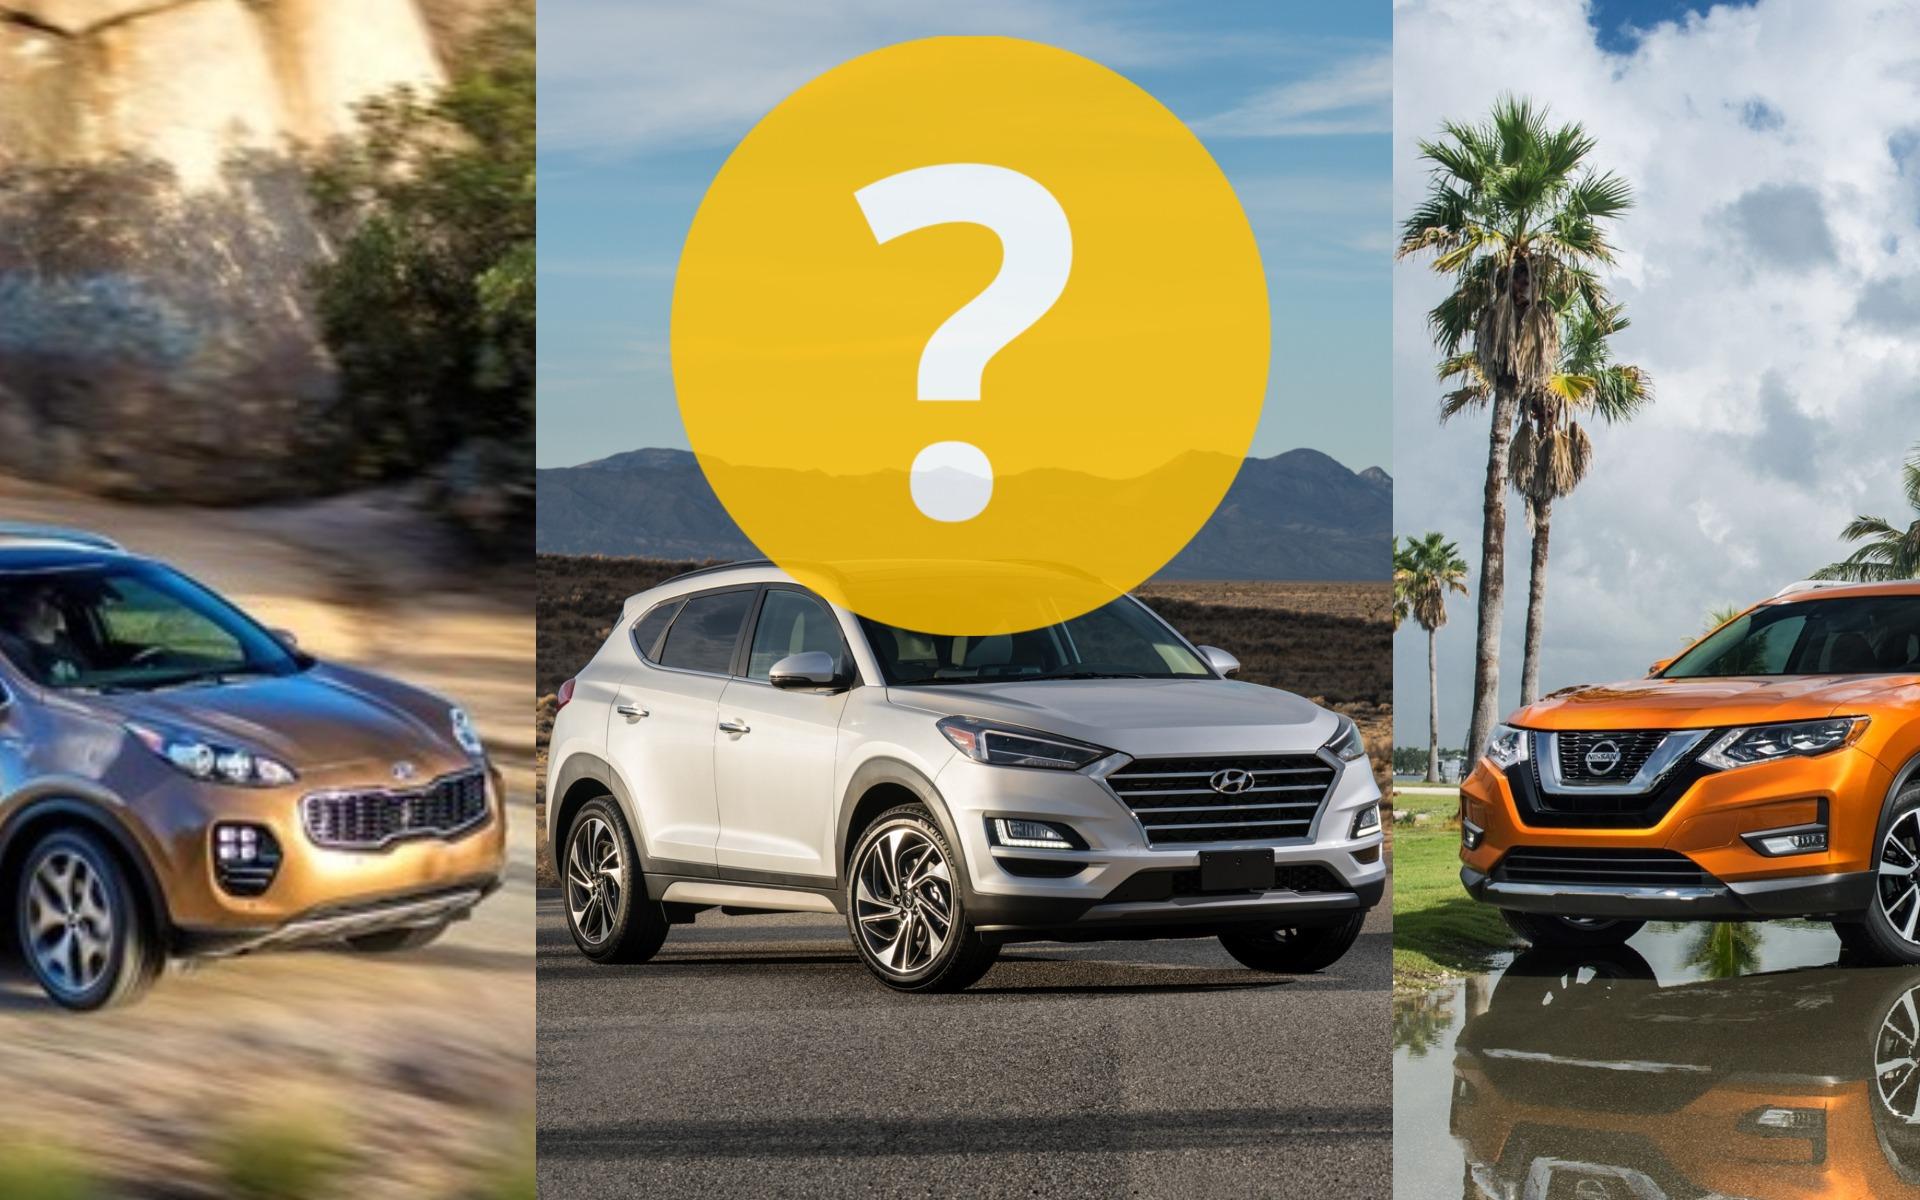 Nissan Rogue S >> Pour conserver pendant dix ans : Hyundai Tucson, Kia Sportage ou Nissan Rogue? - 1/13